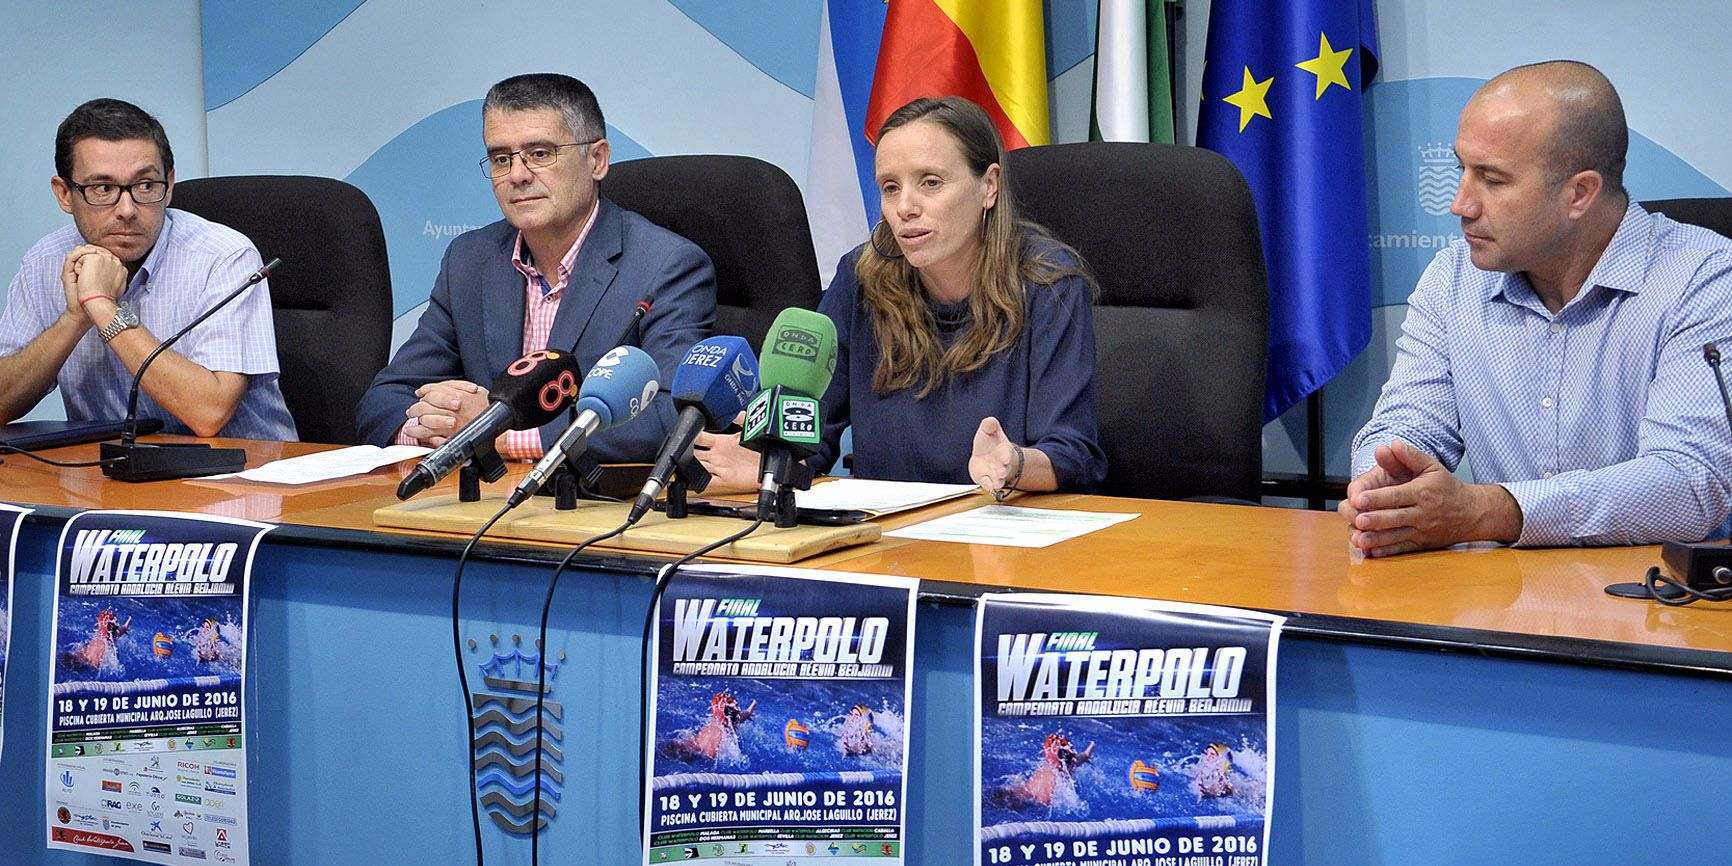 Laura Alvarez pres Cto Andalucia Waterpolo 1